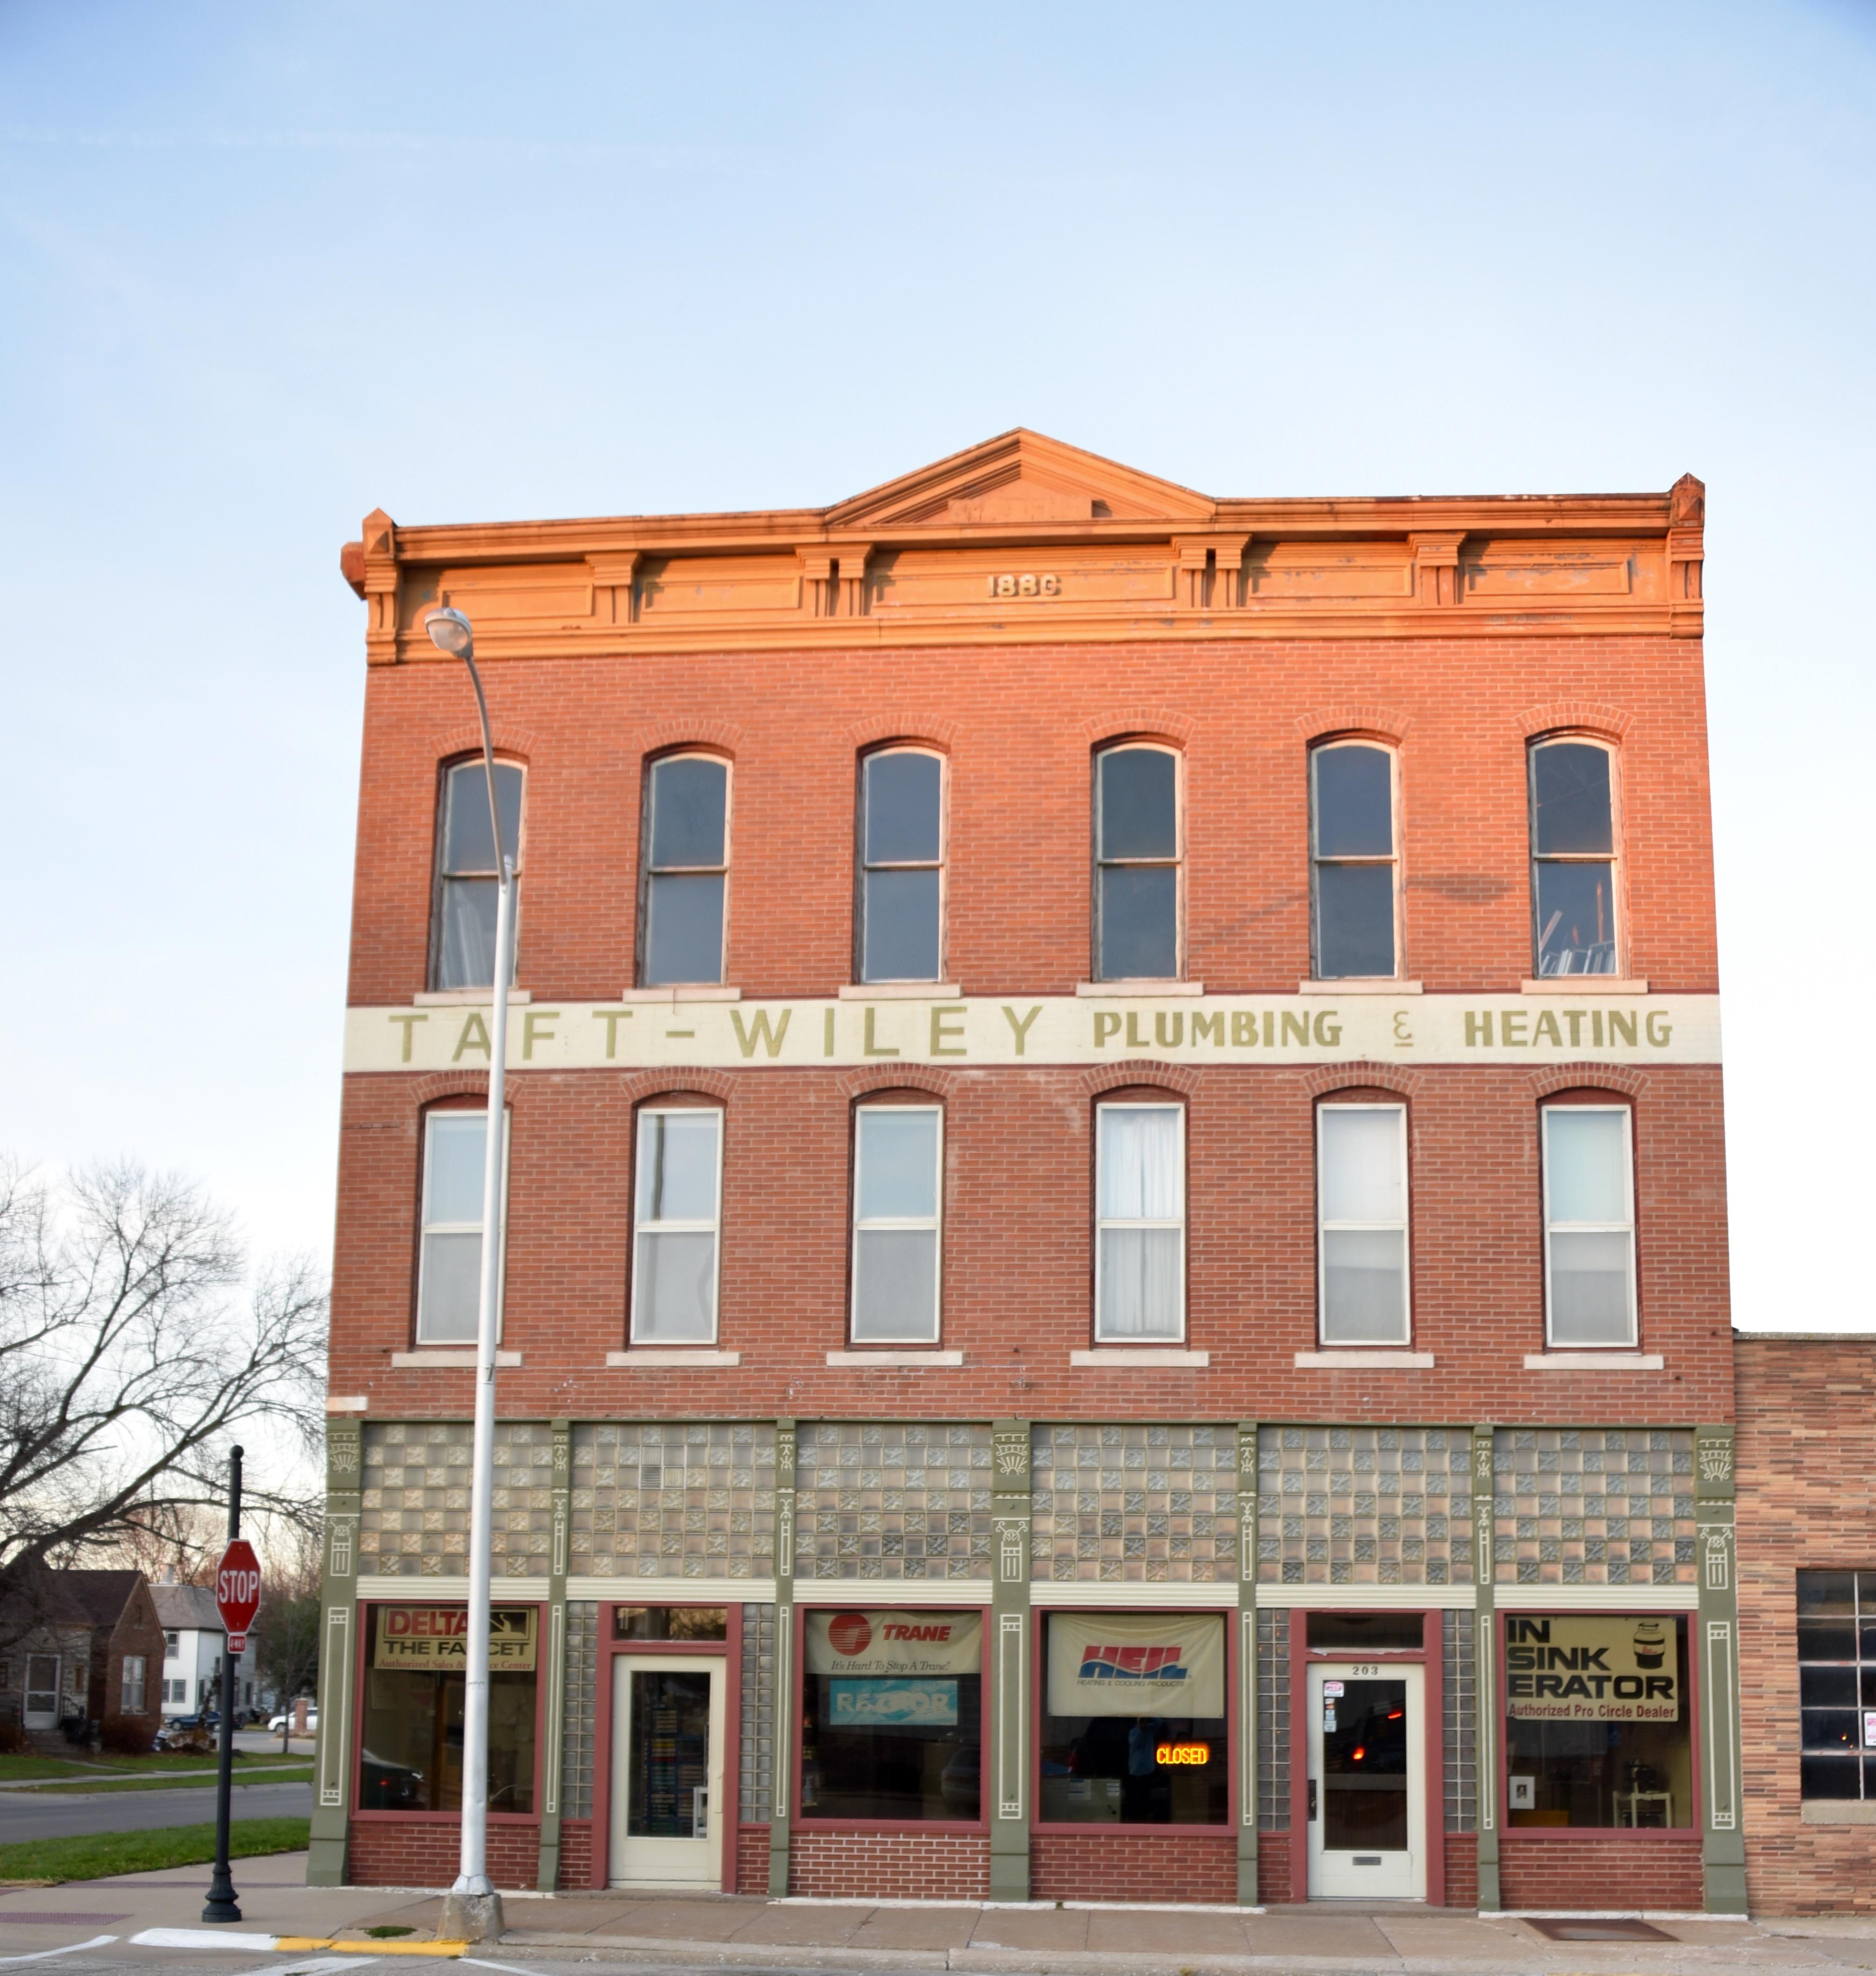 Zuhn Building - Wikipedia